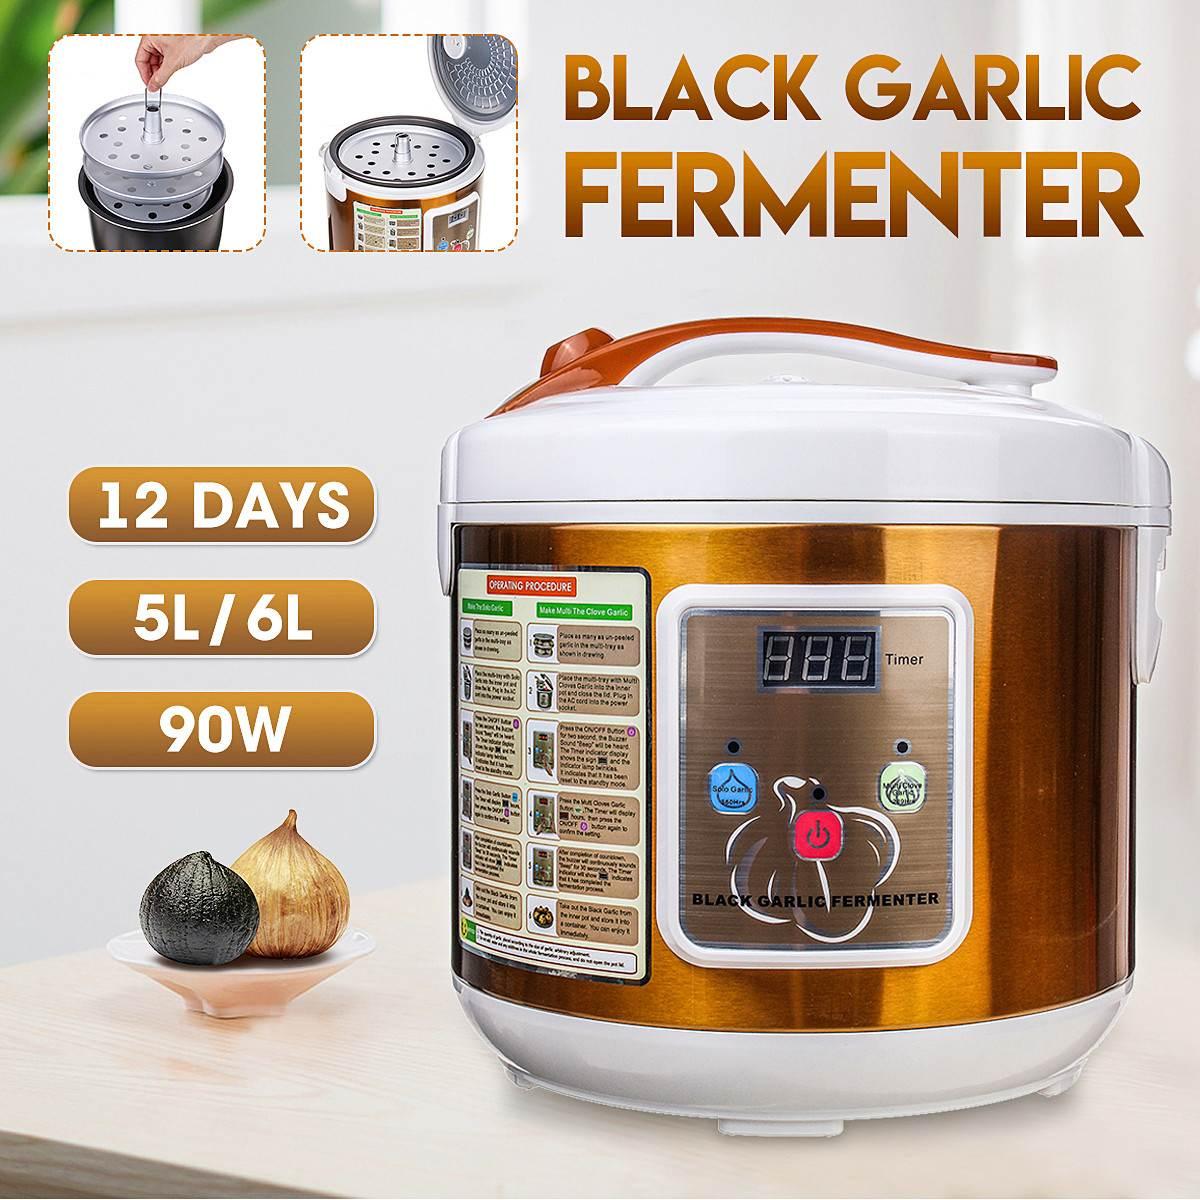 5L/6L Automatic Black Garlic Fermenter Home DIY Timer Digital Zymolysis Pot Maker 110V 220V Black Garlic Fermenting Machine Tool